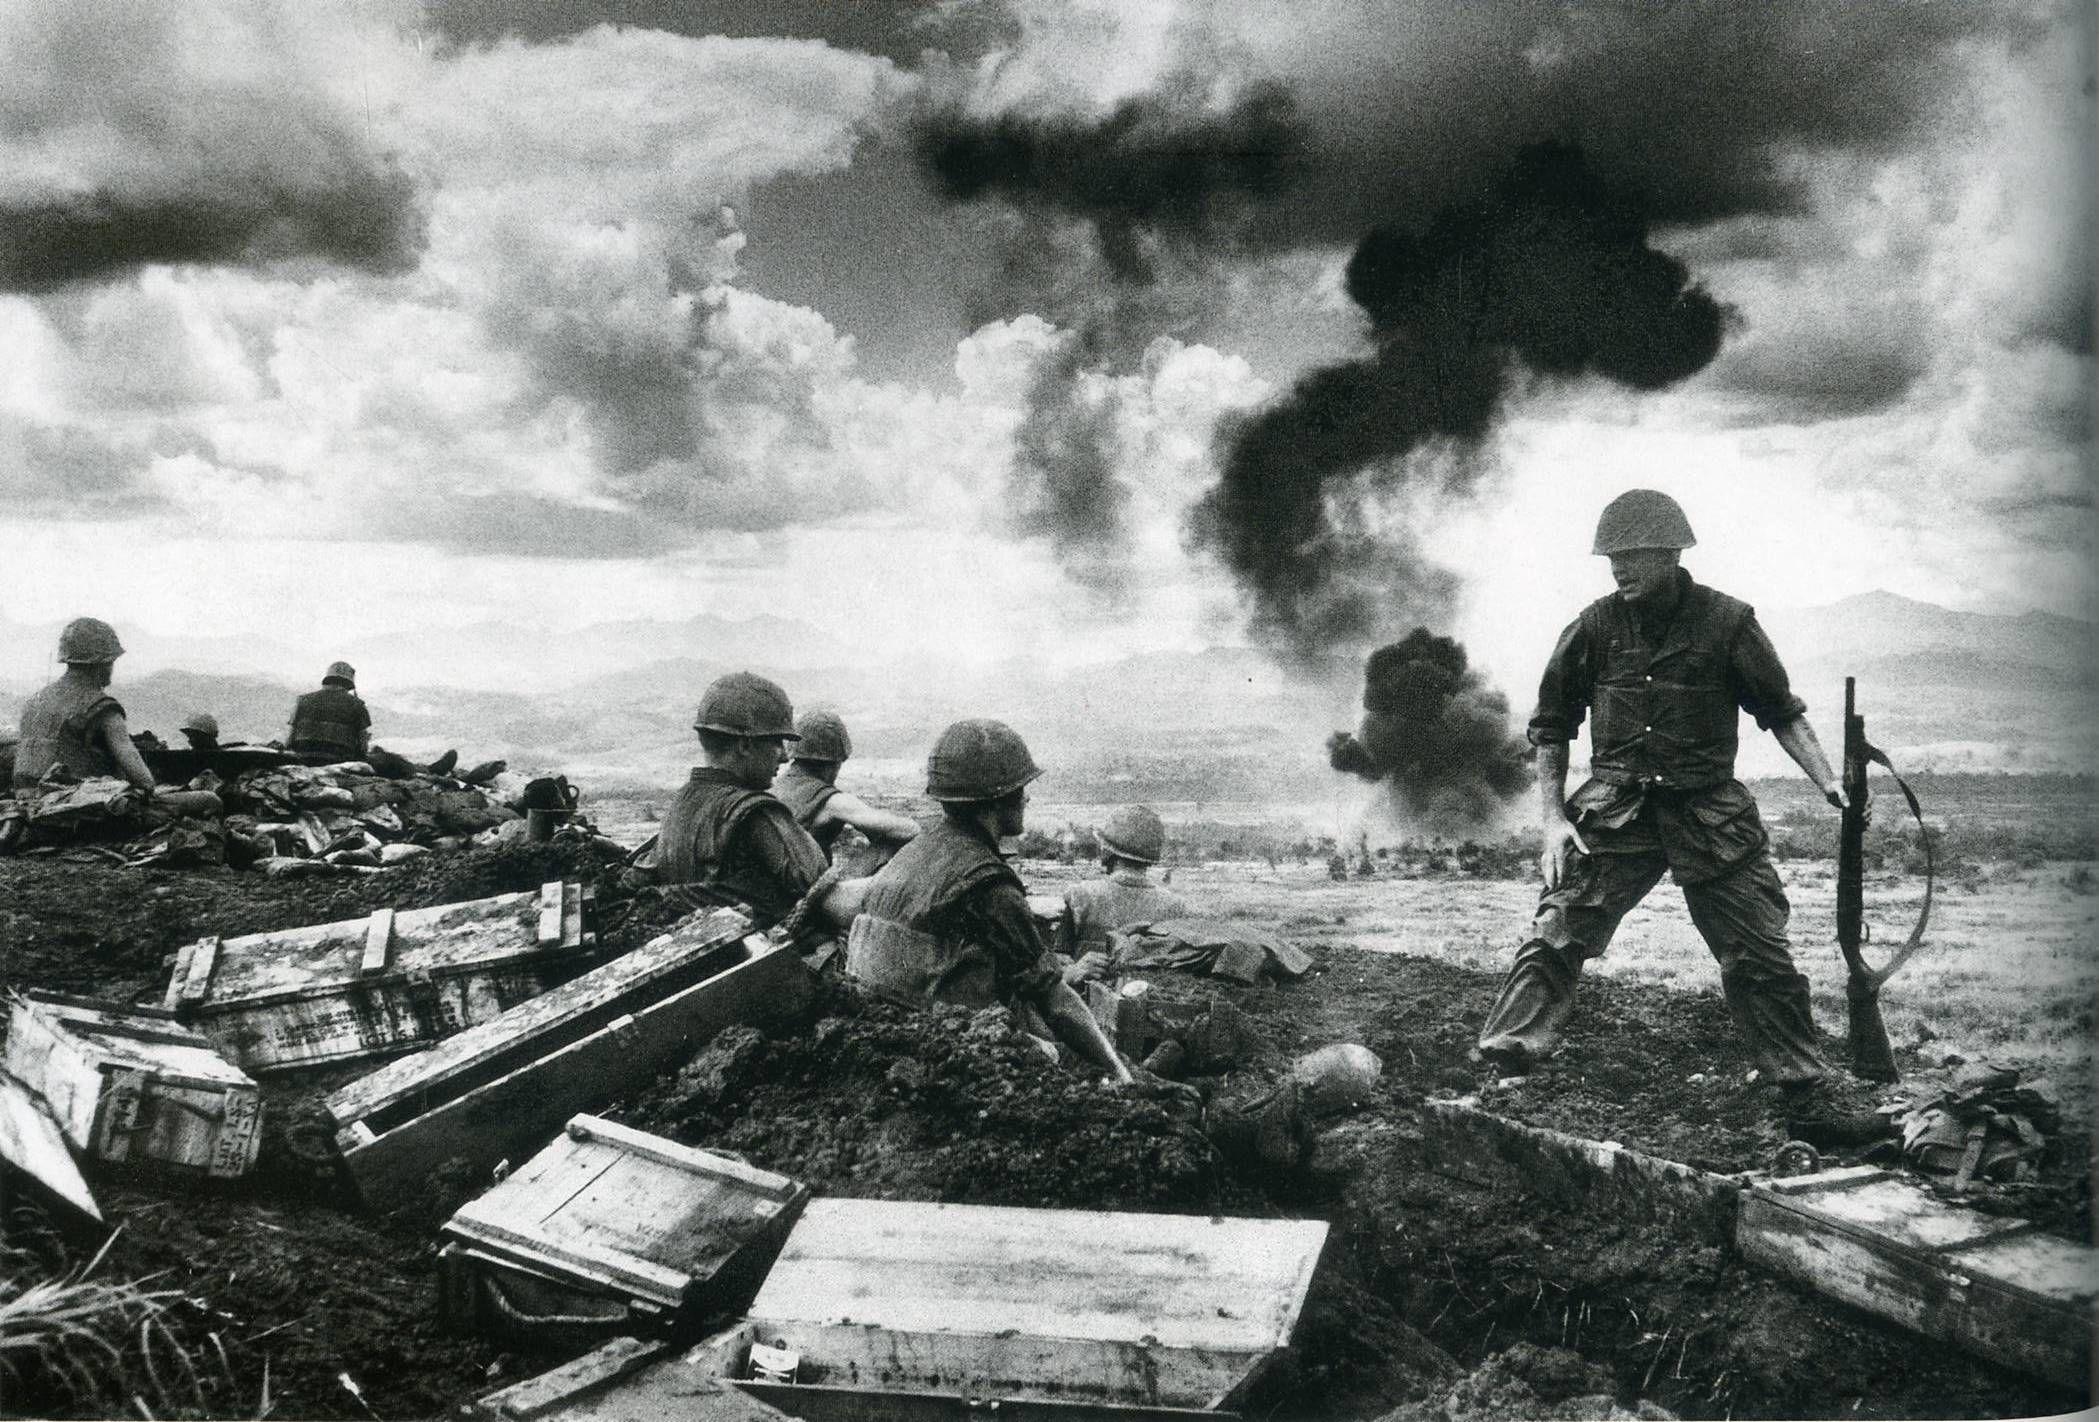 Vietnam Photography Vietnam War Wallpapers Photography Places 2099x1422